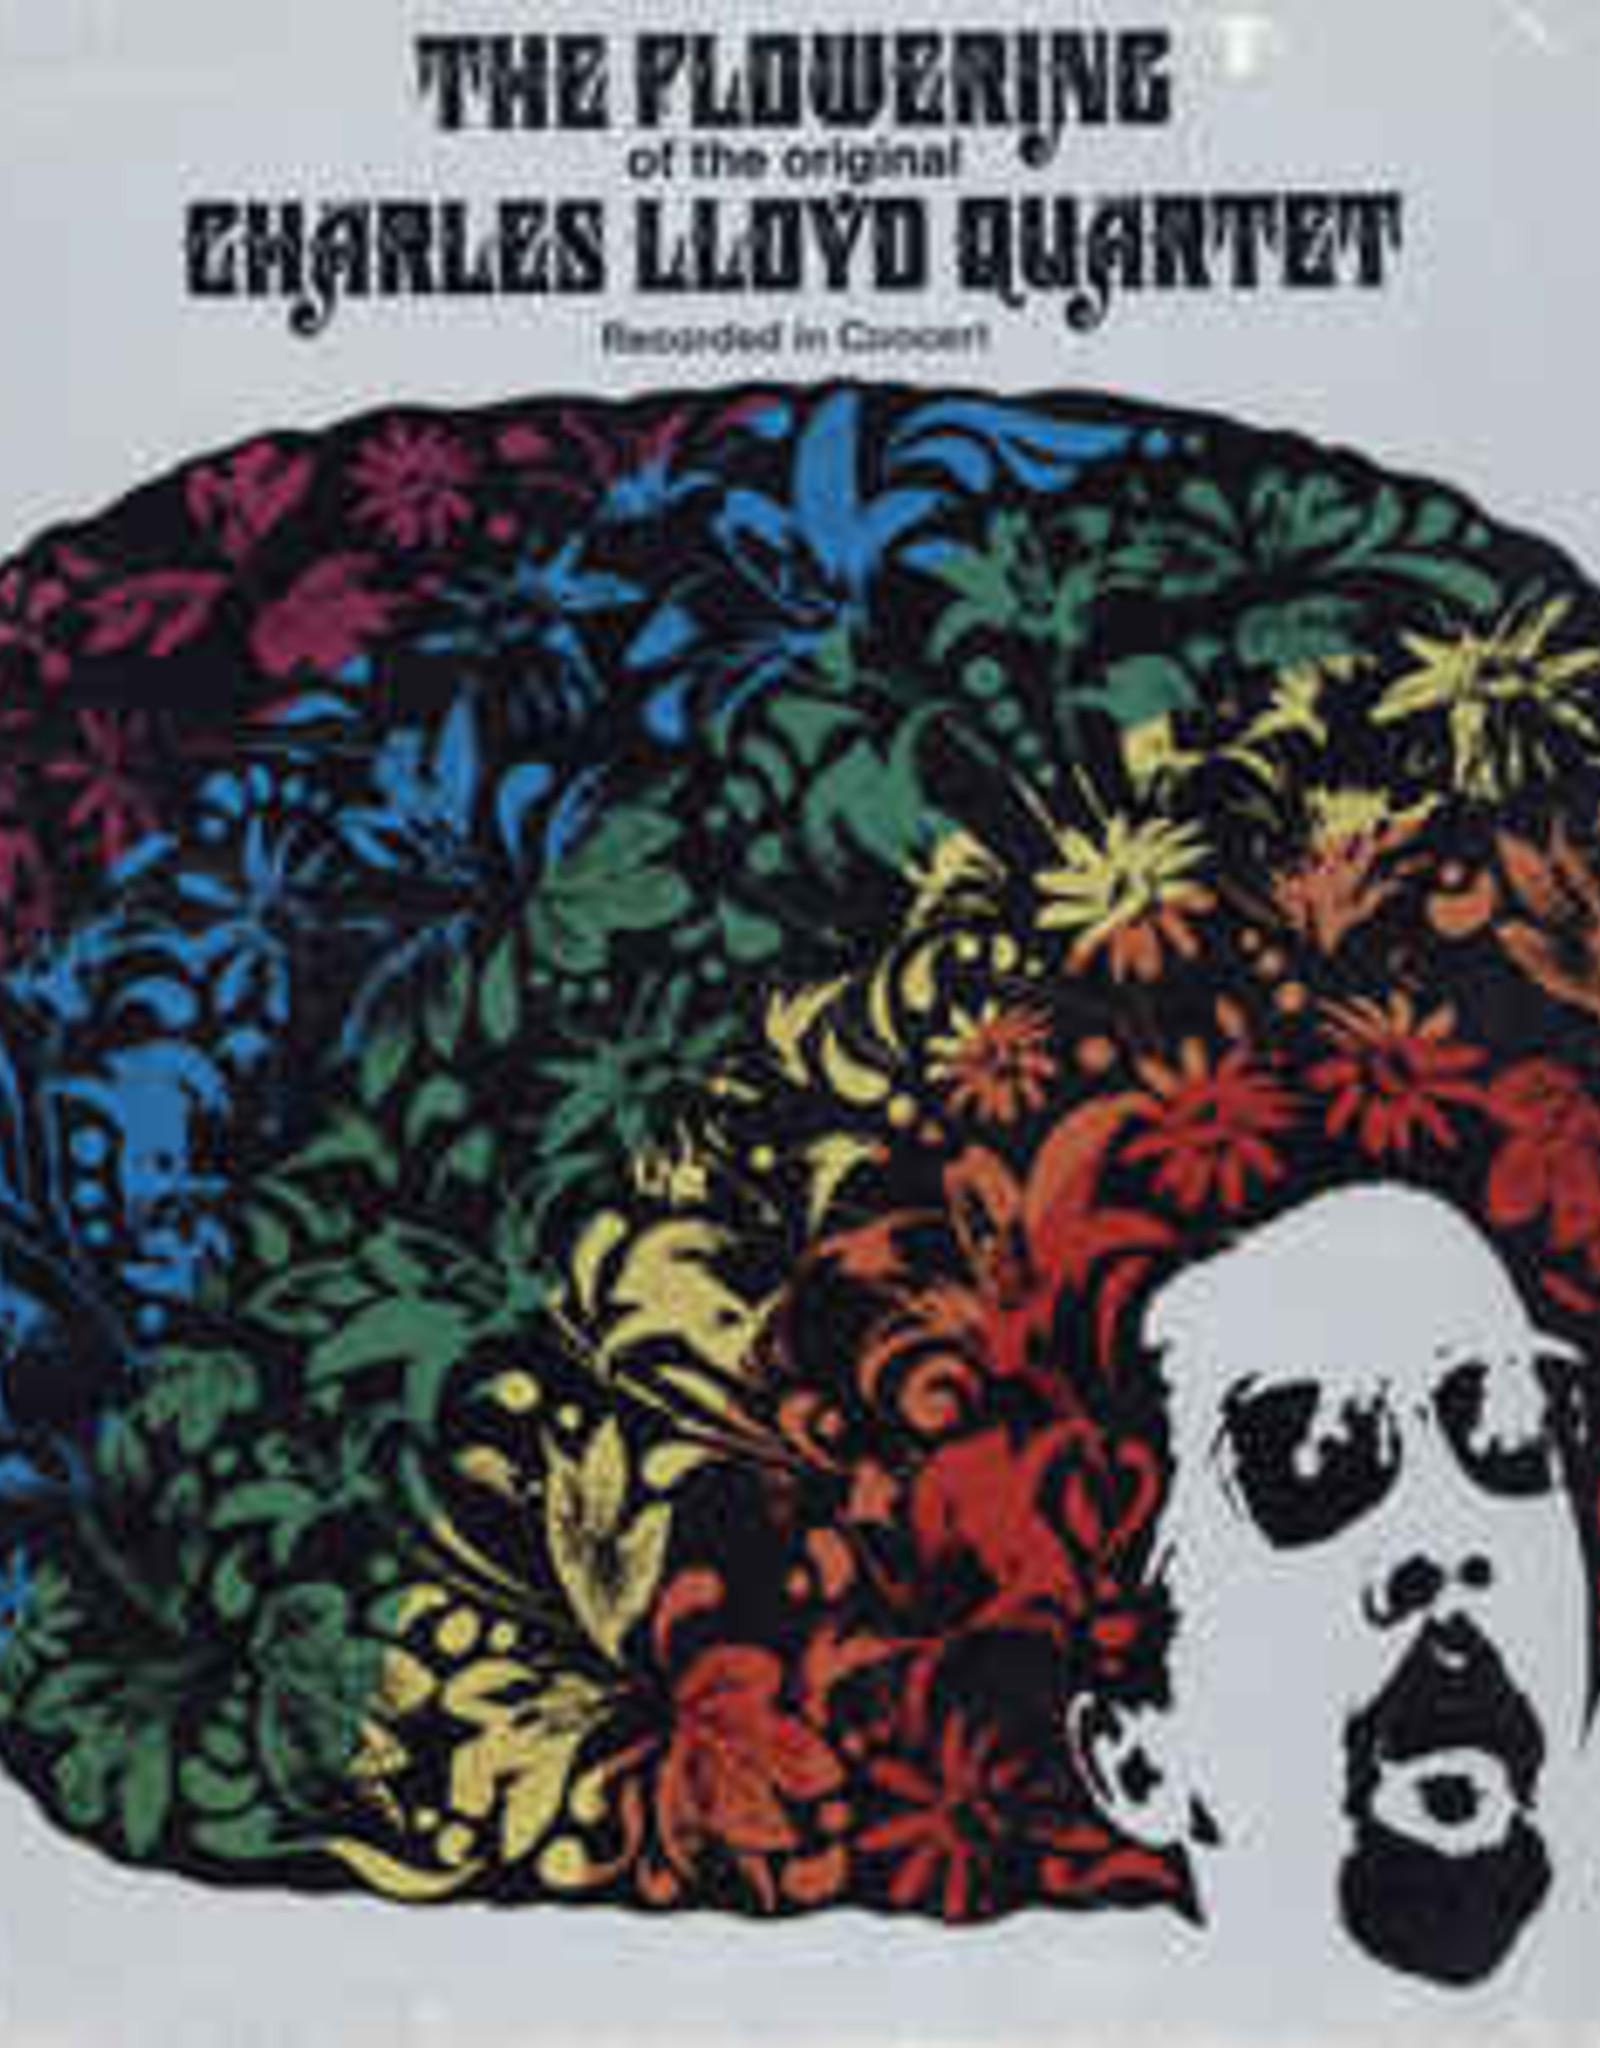 The Charles Lloyd Quartet - The Flowering